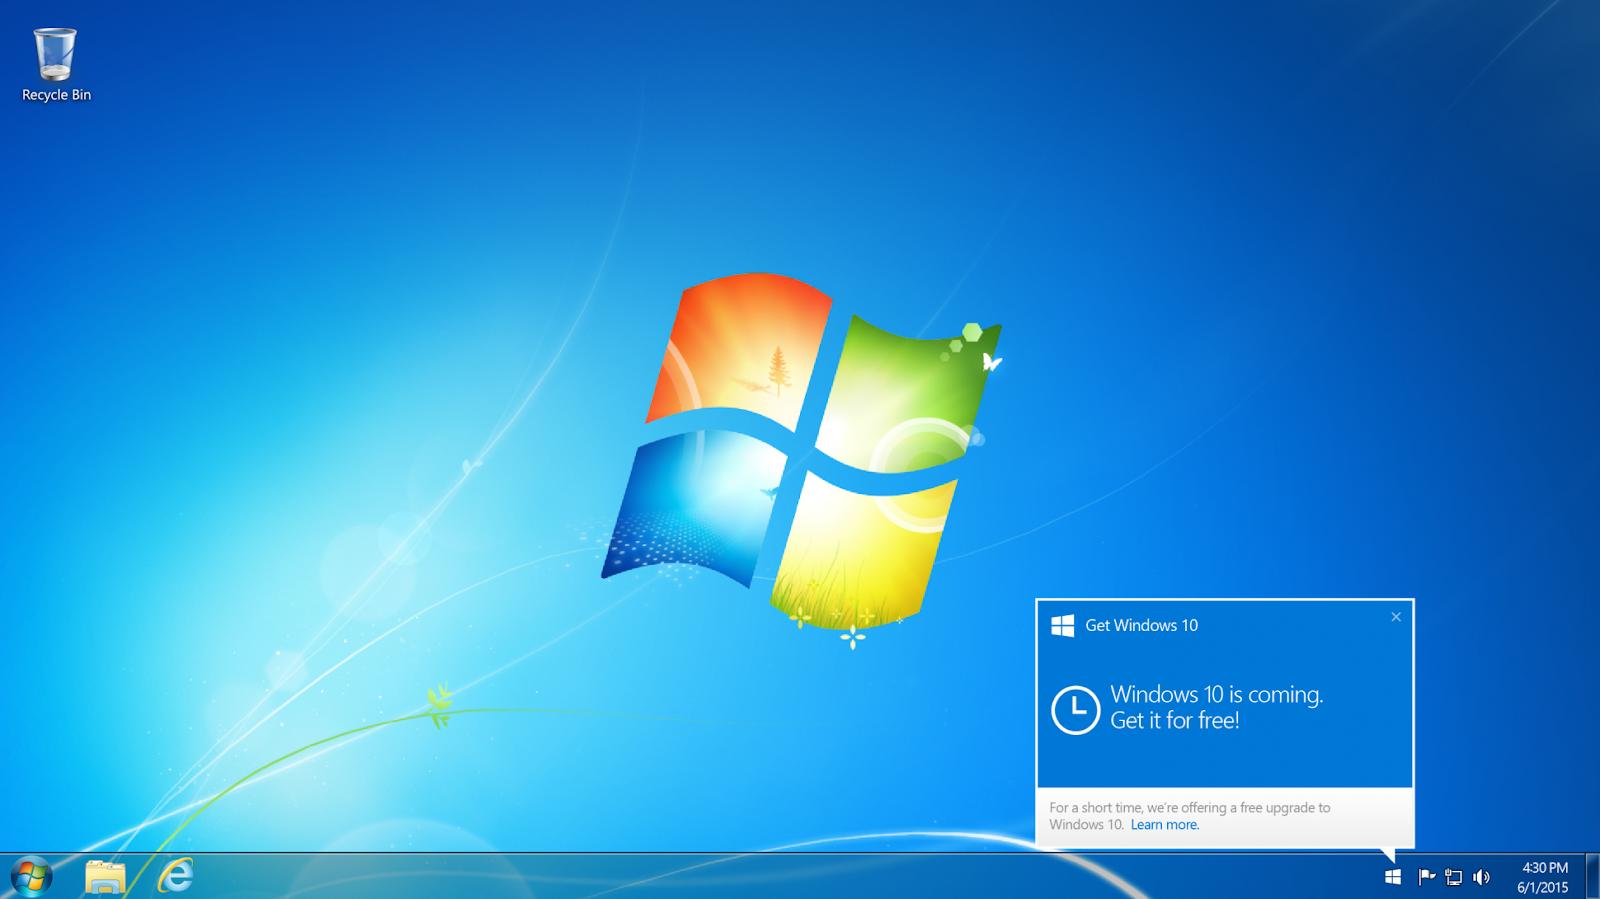 windows 7 ultimate 32bit and 64bit free download links